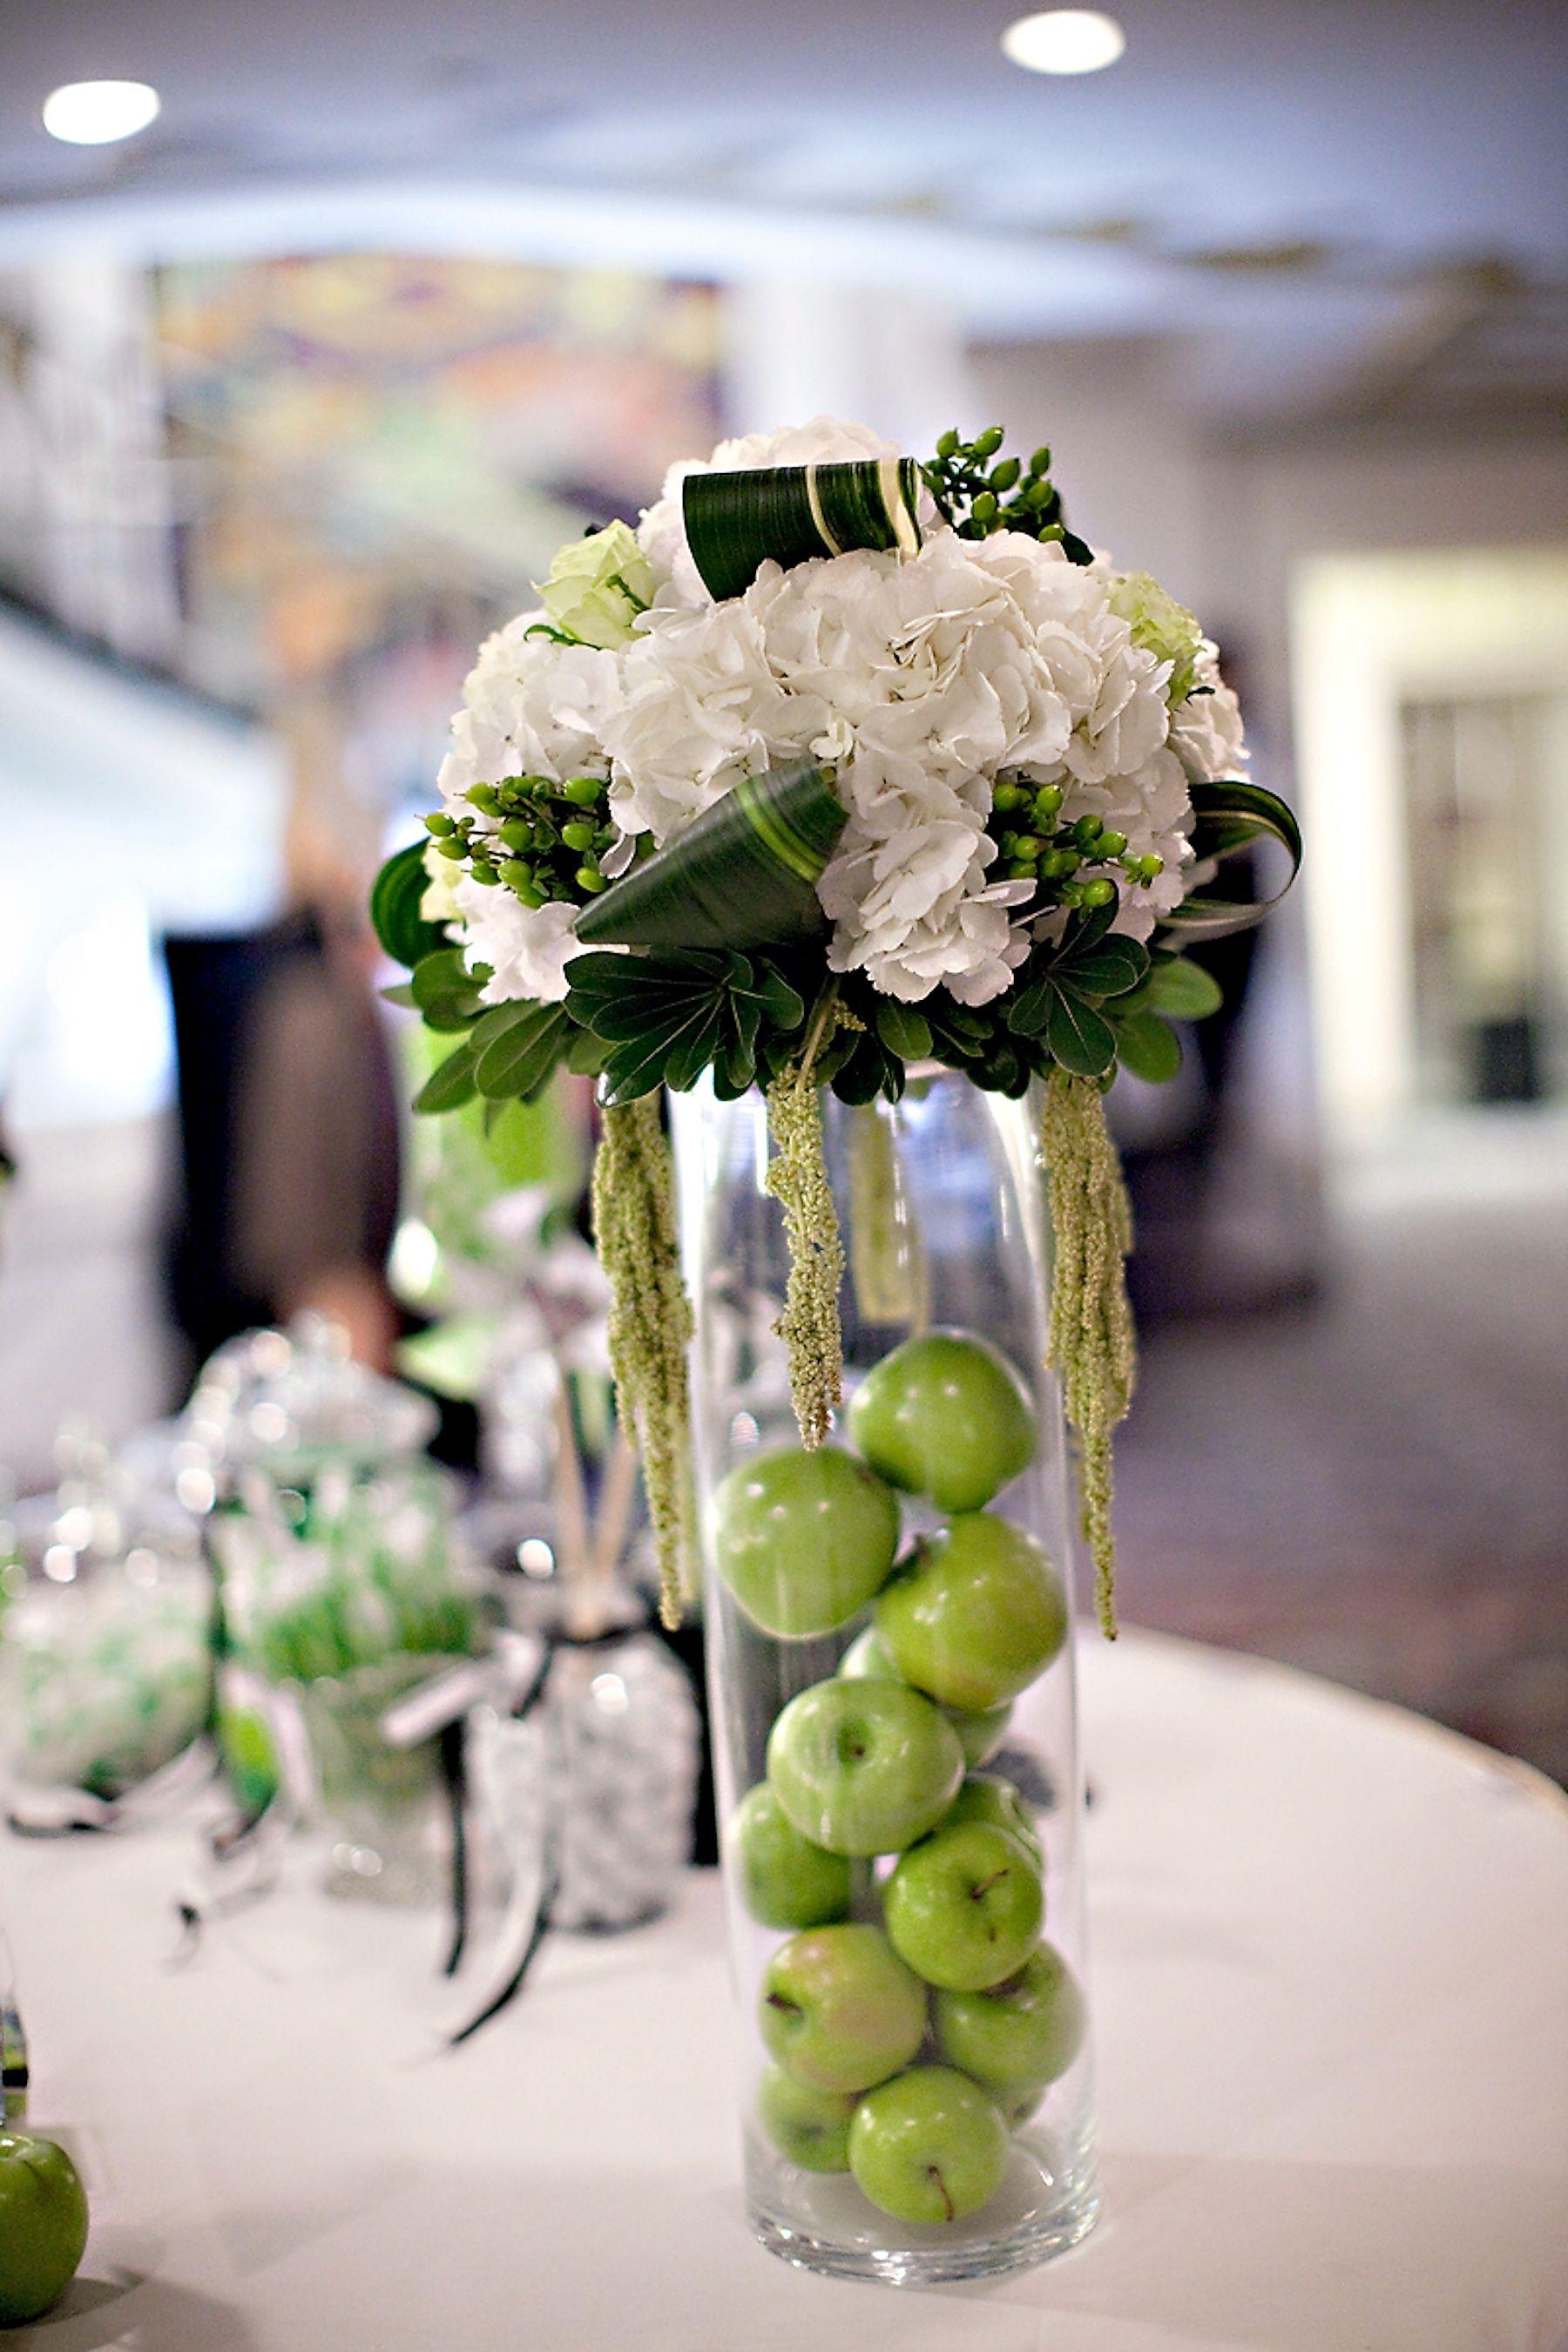 Original centerpieces for weddings      wedding flowers wedding receptionoriginal centerpieces for weddings      wedding flowers wedding  . Flowers For Wedding Reception Centerpieces. Home Design Ideas